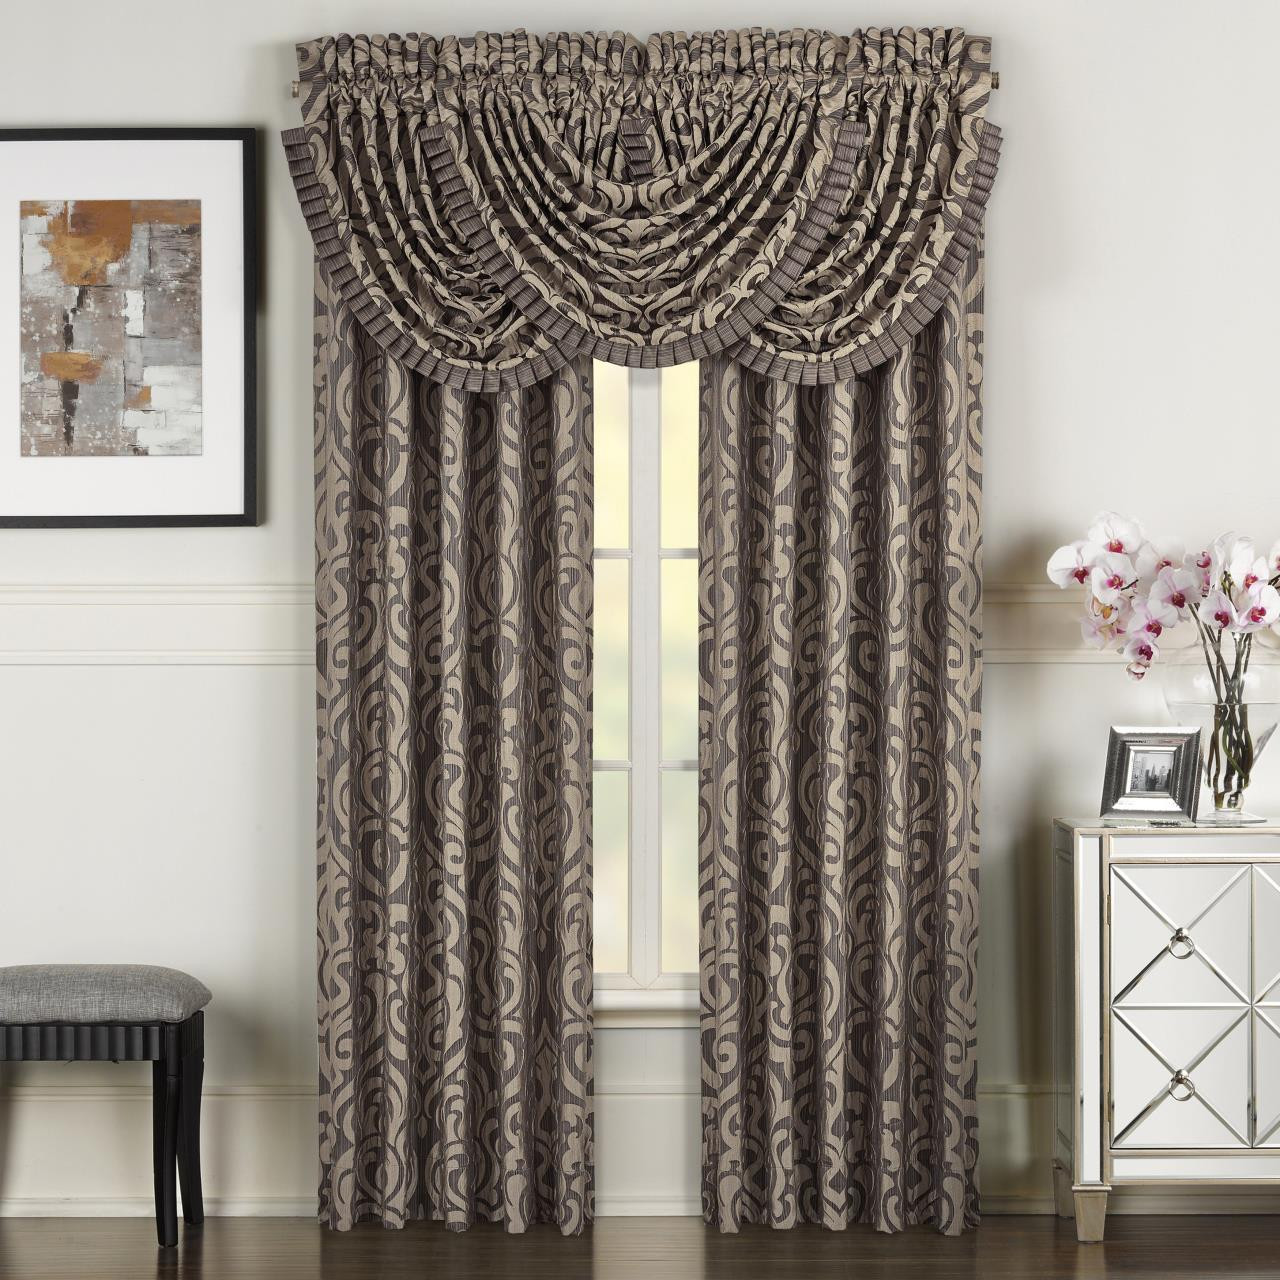 Astoria Mink Curtains - 846339080319